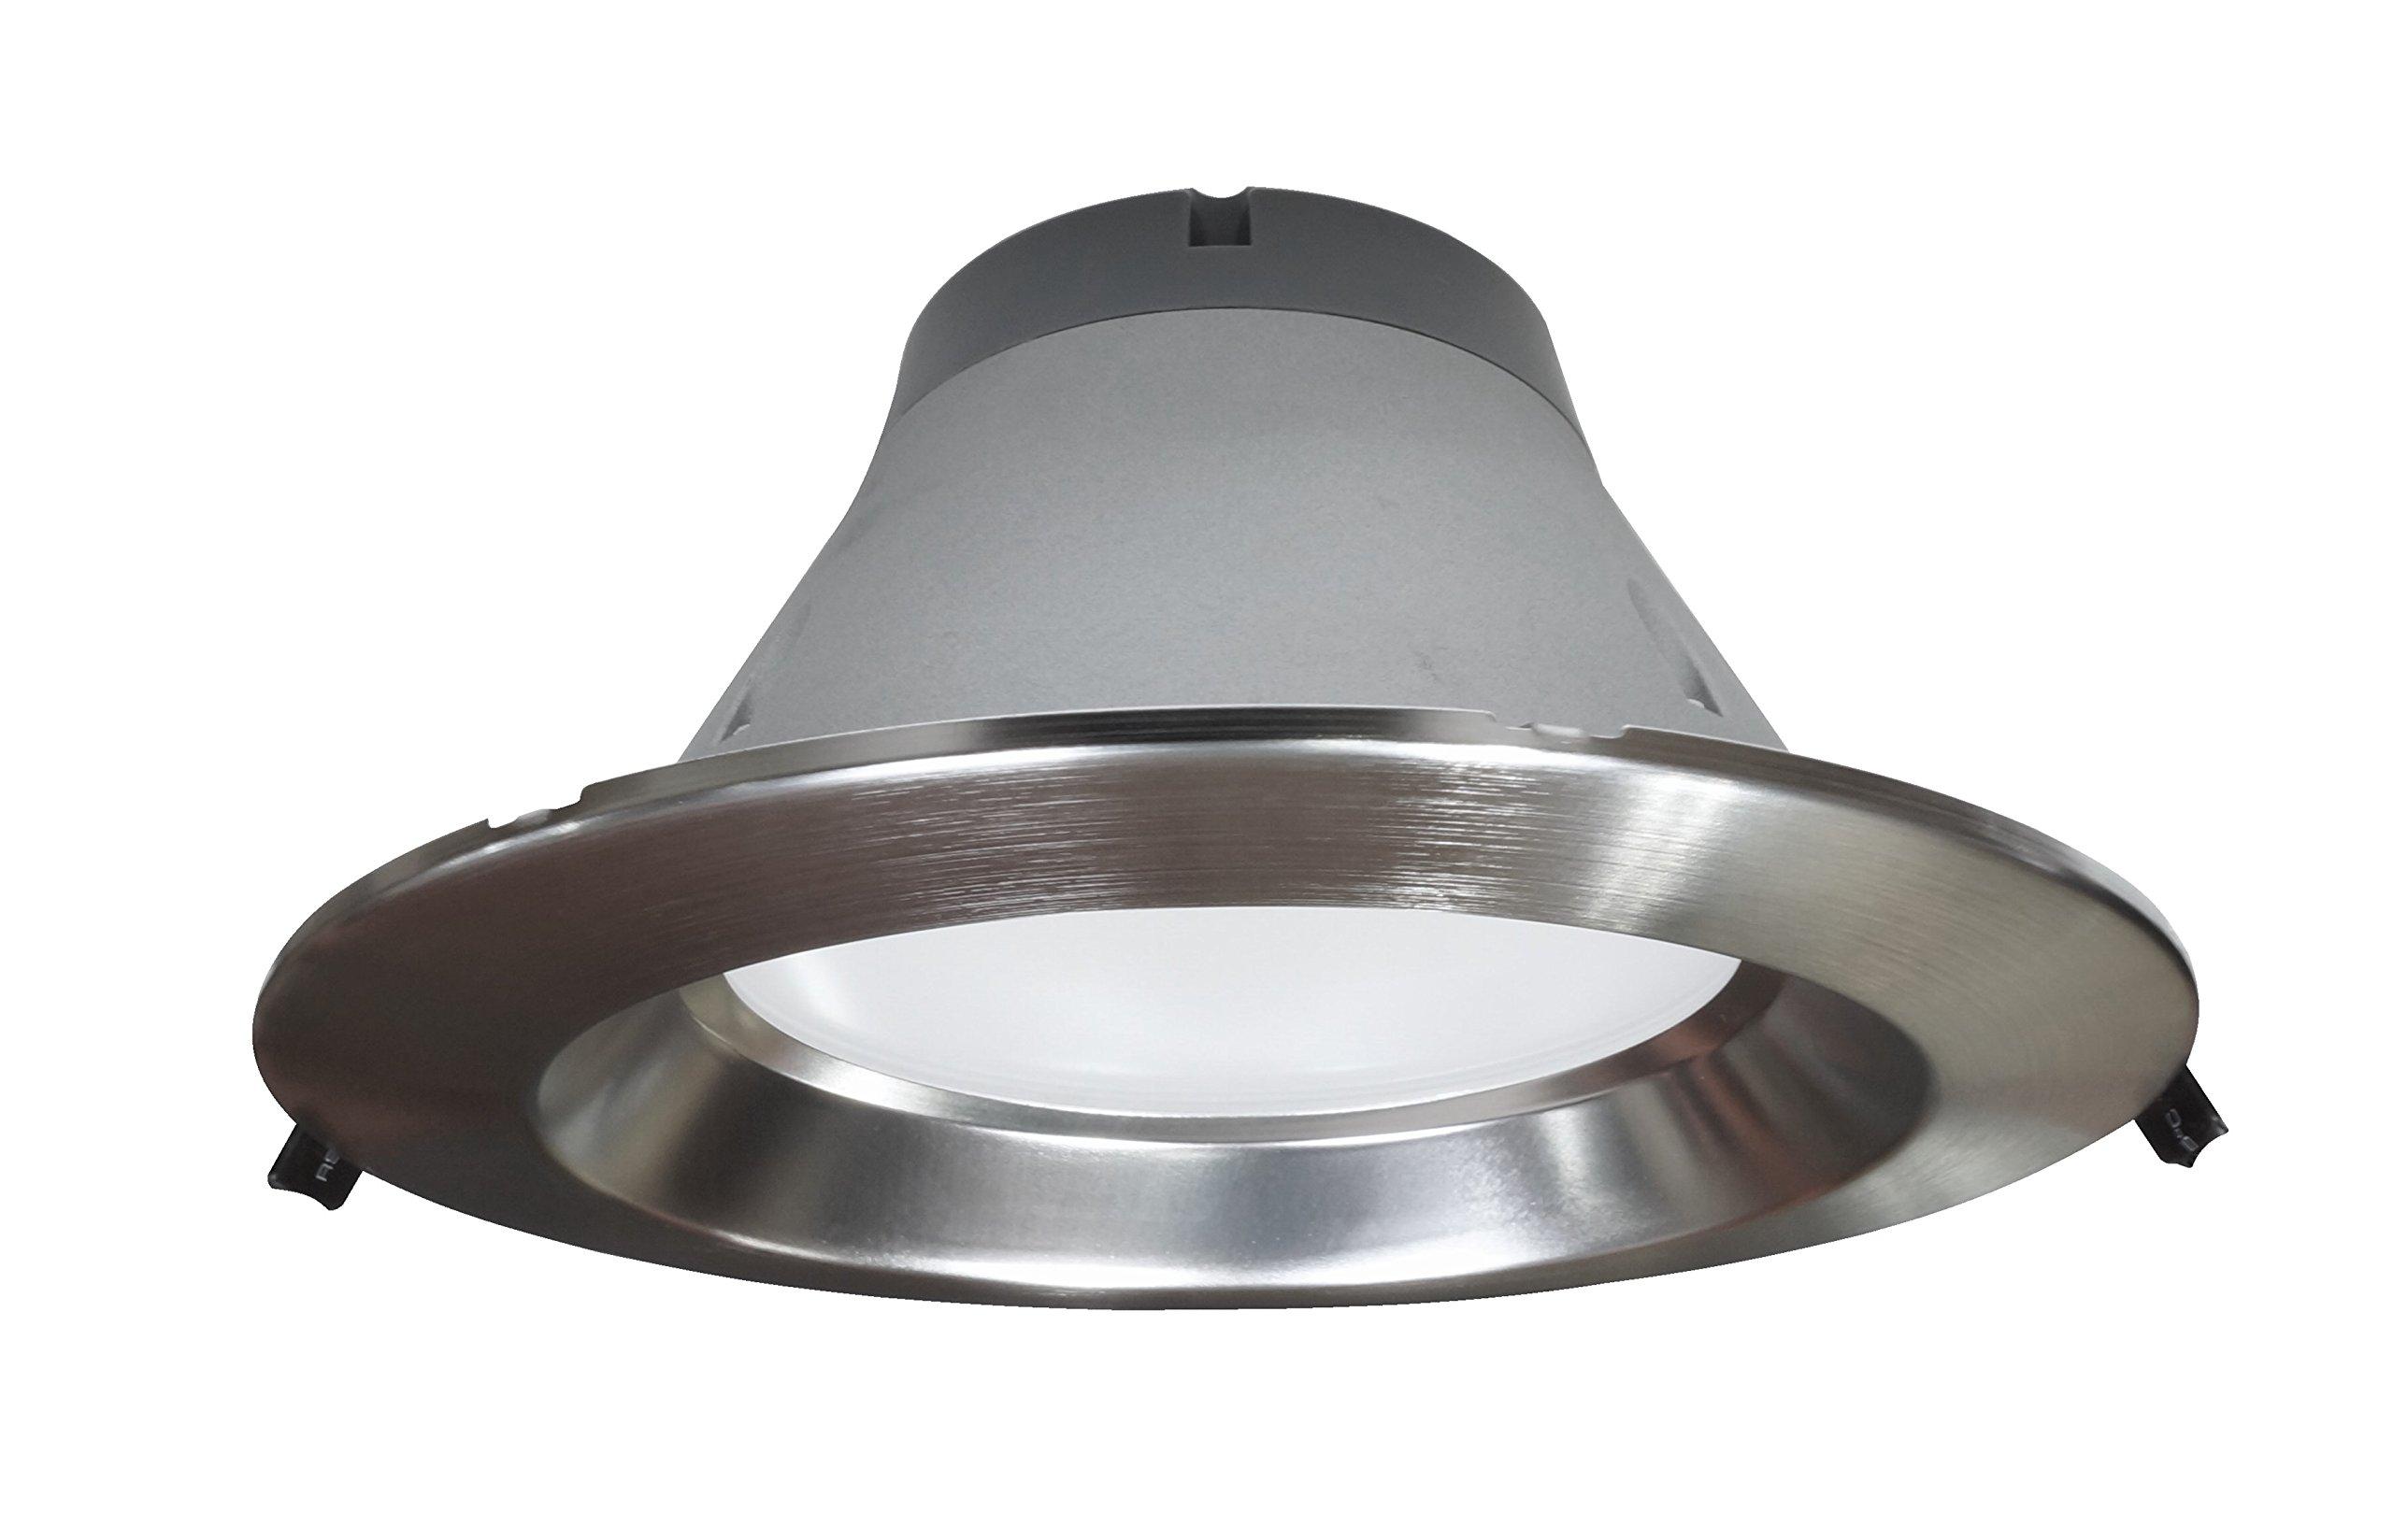 NICOR Lighting Dimmable 2300-Lumen 3500K LED Recessed Downlight, Nickel (CLR8-10-UNV-35K-NK)